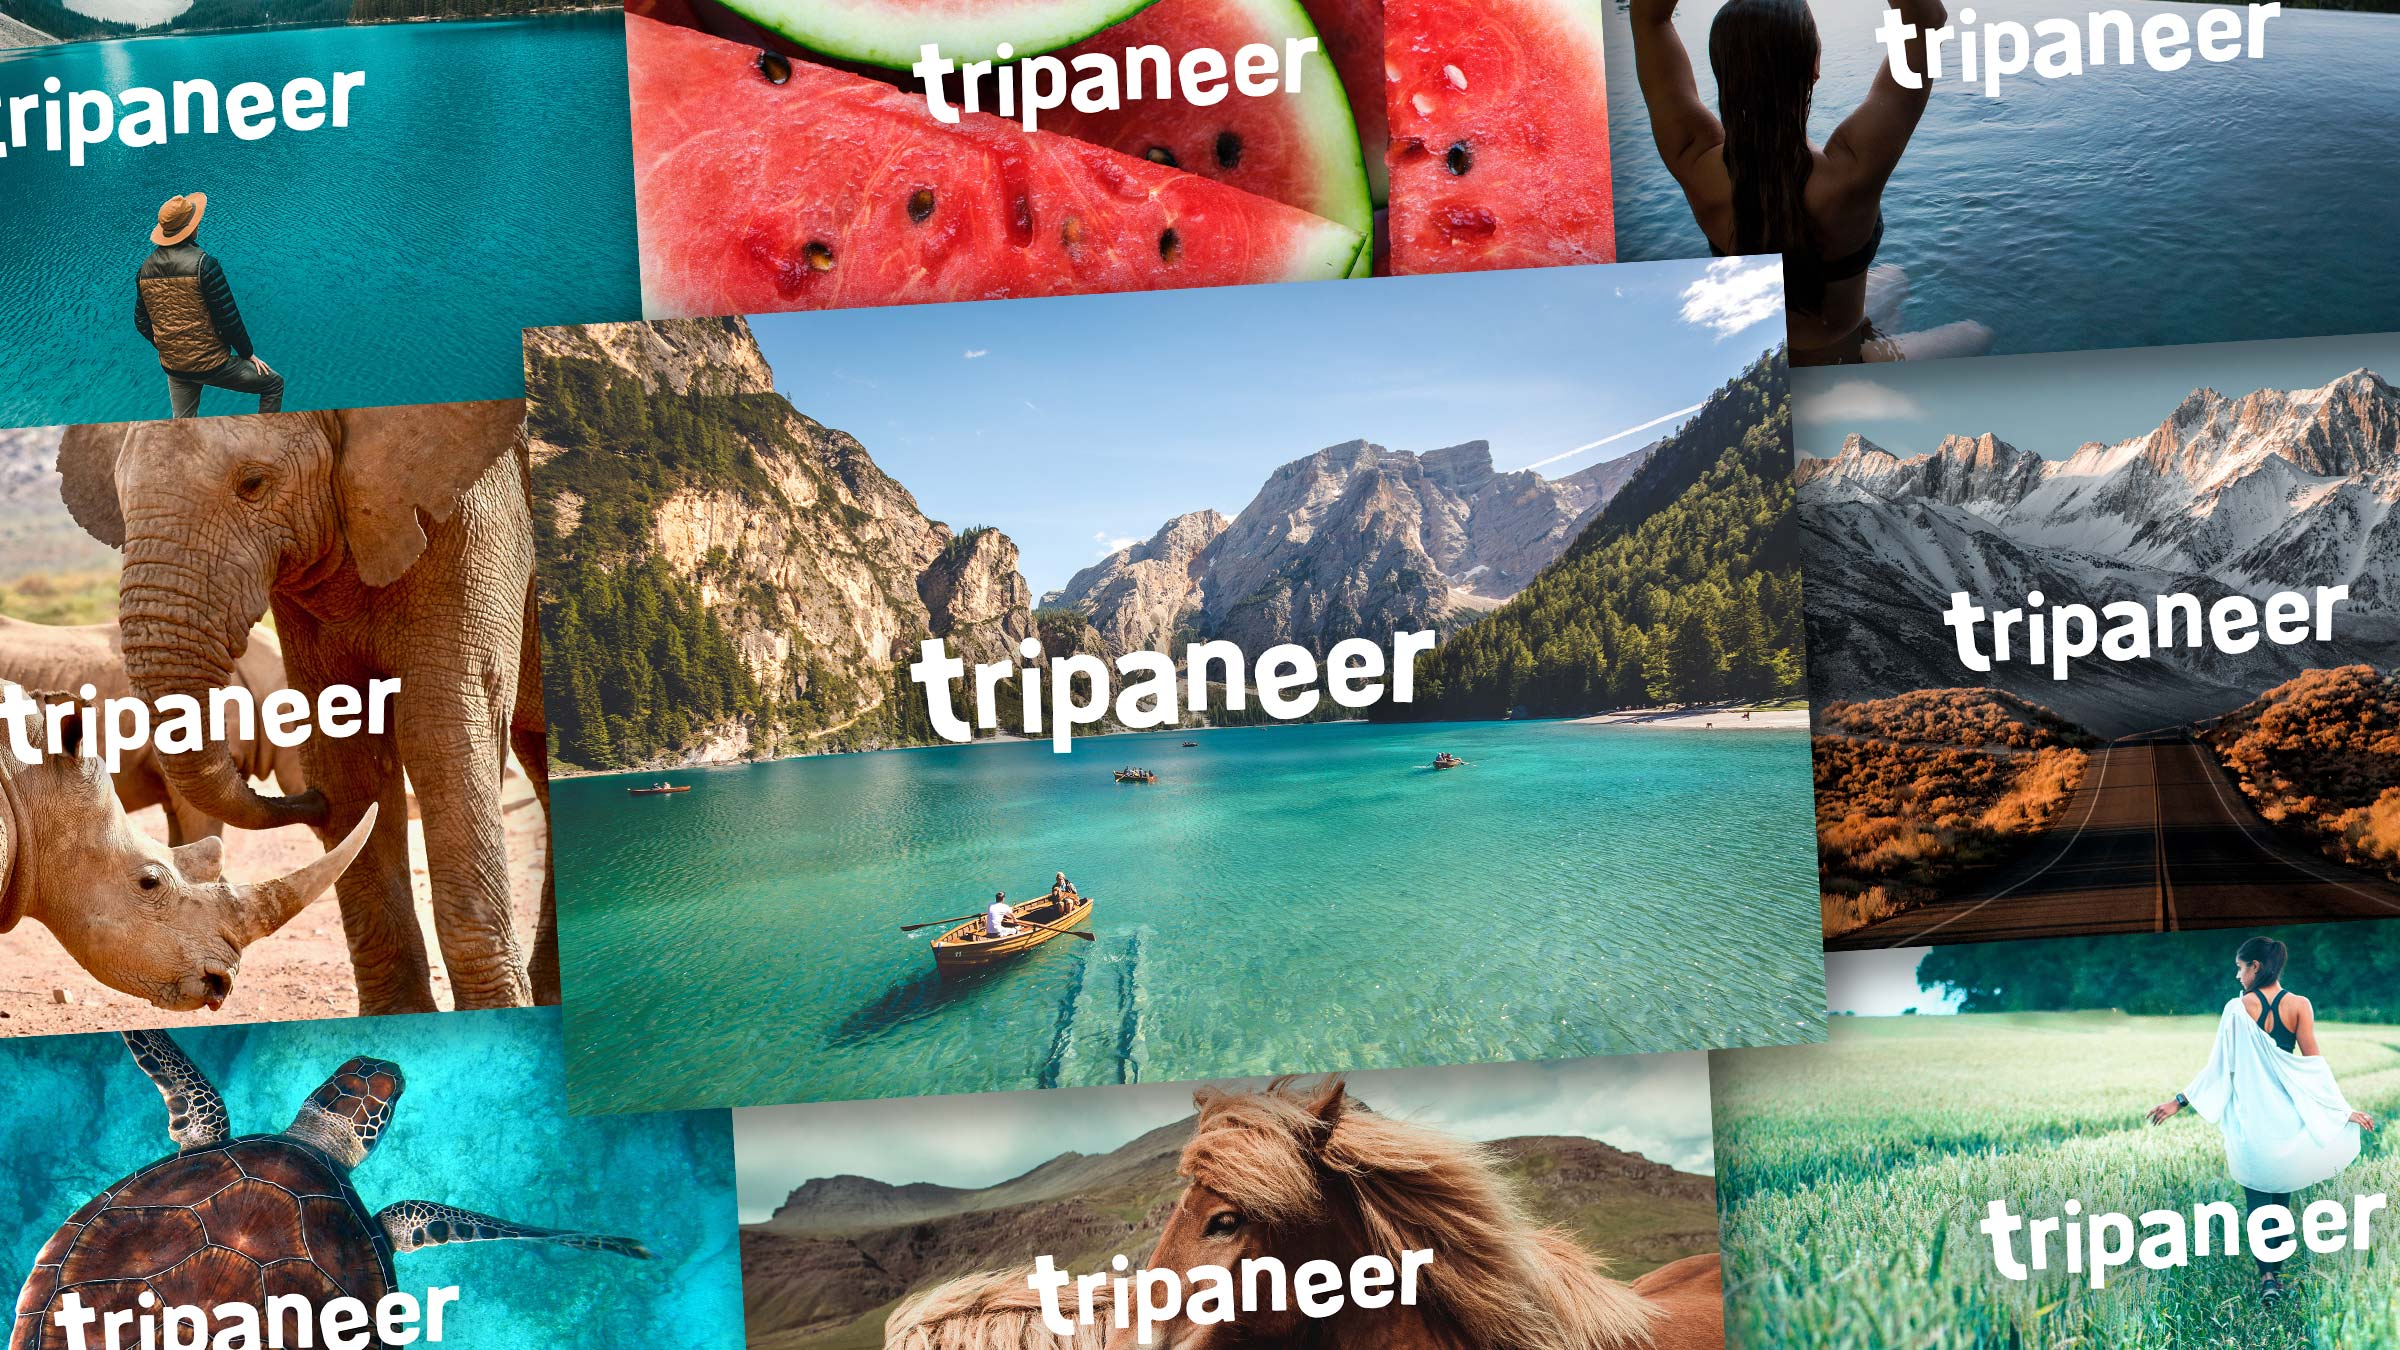 tripaneer11